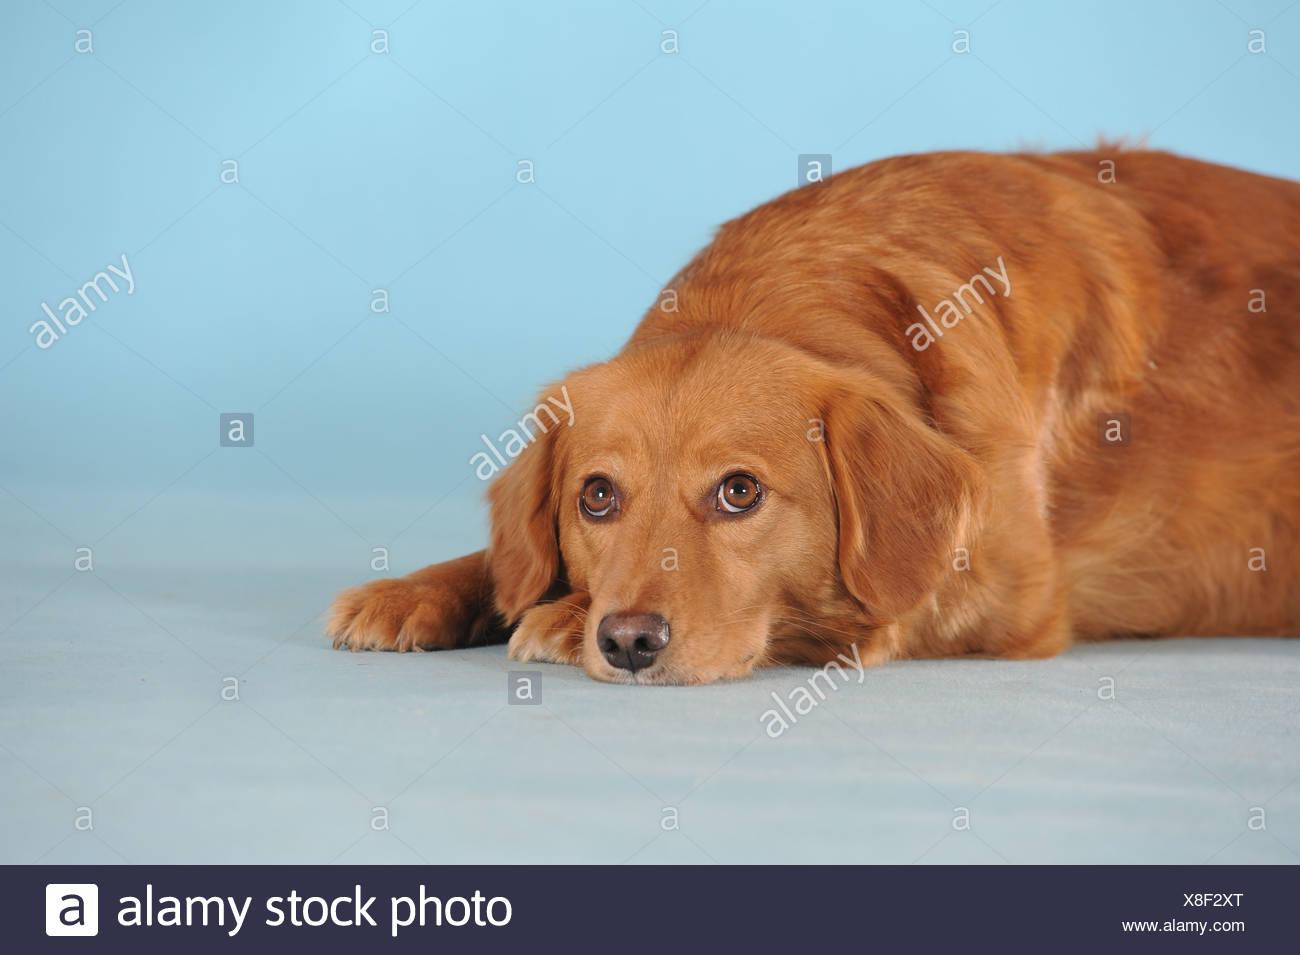 adf3bcae4a42f Dog Head On Paws Stock Photos   Dog Head On Paws Stock Images - Alamy